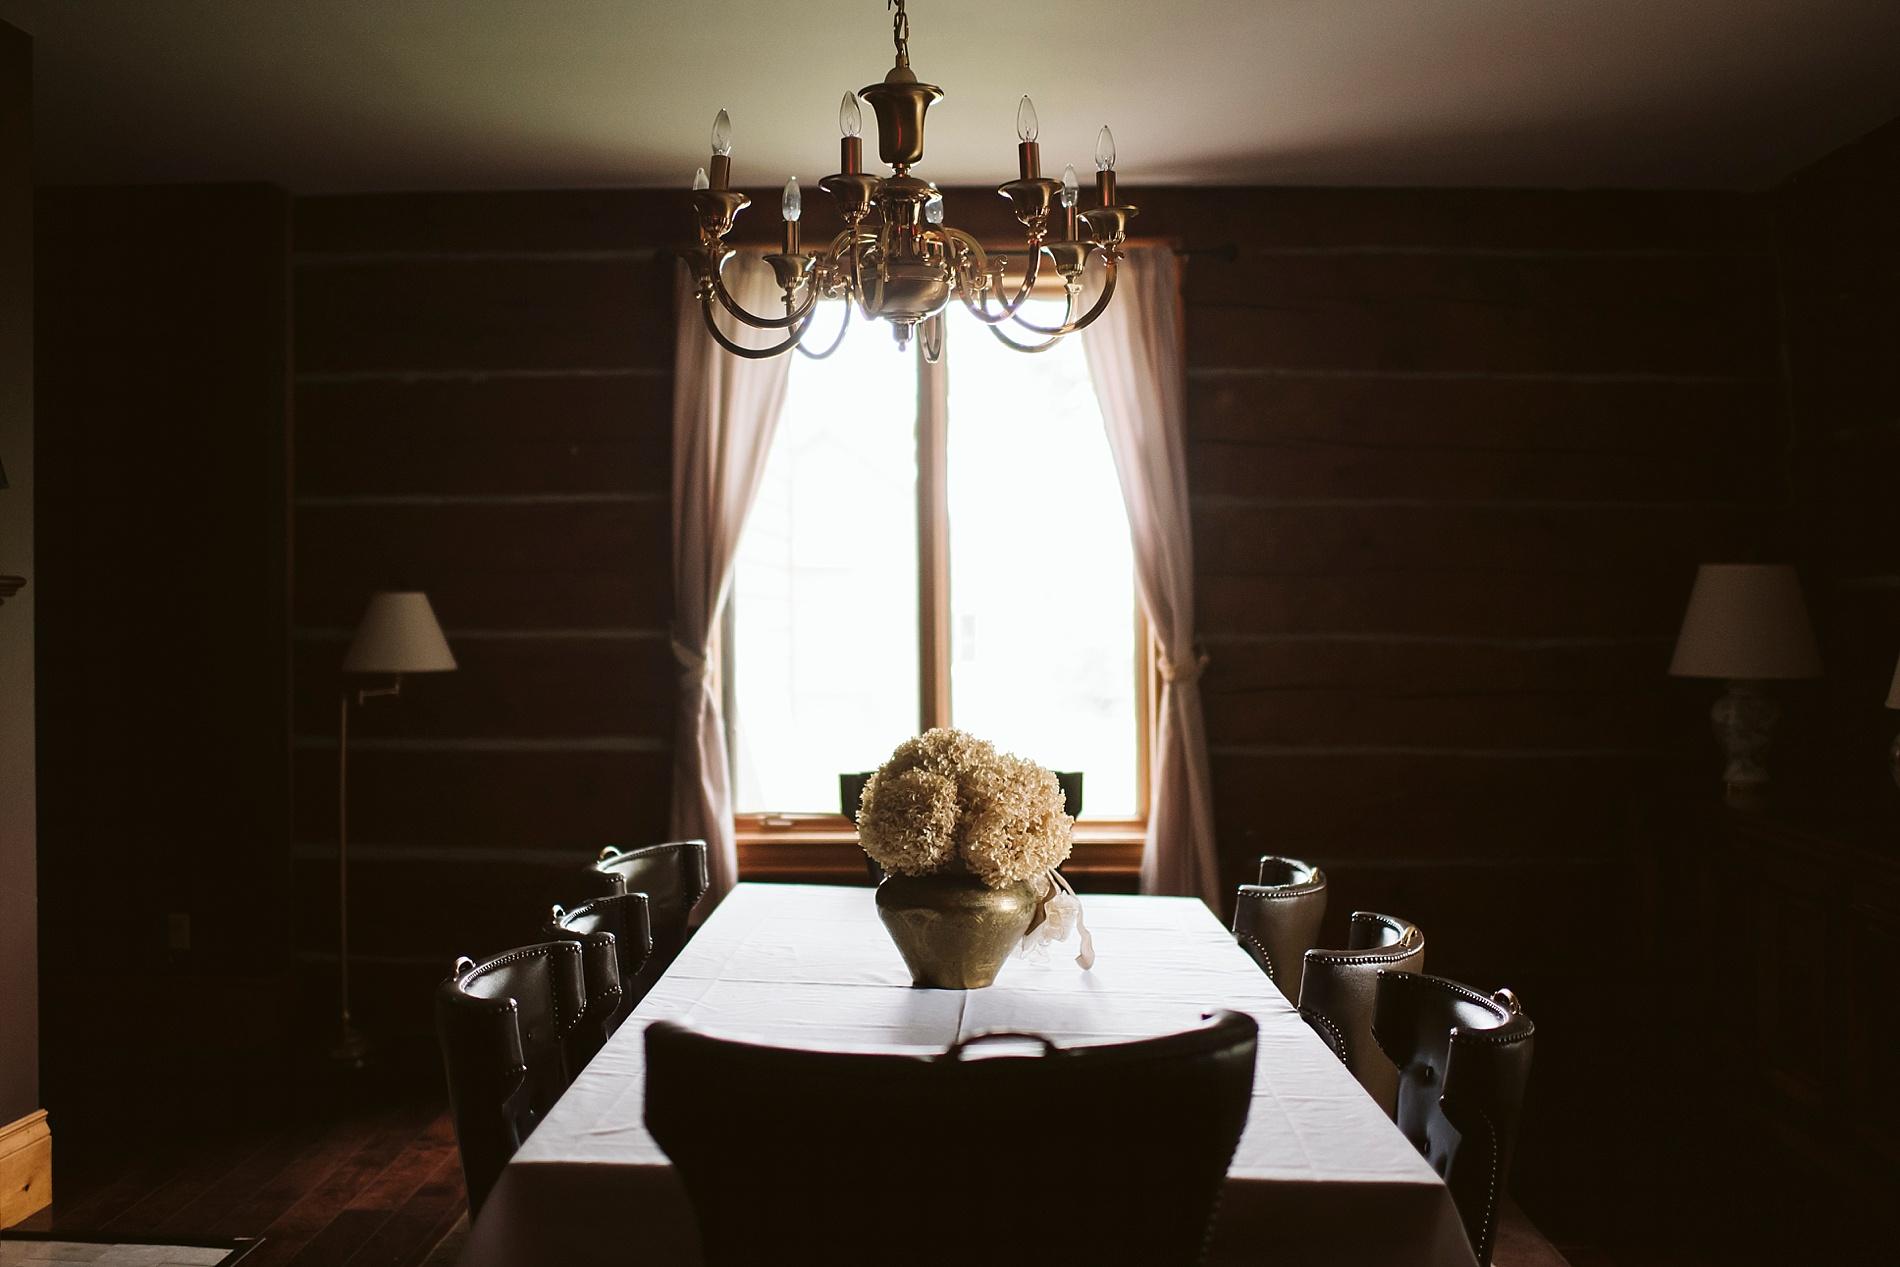 Kawartha_Lakes_Wedding_Bobcageon_Eganridge_Resort_Toronto_Photographer_0021.jpg